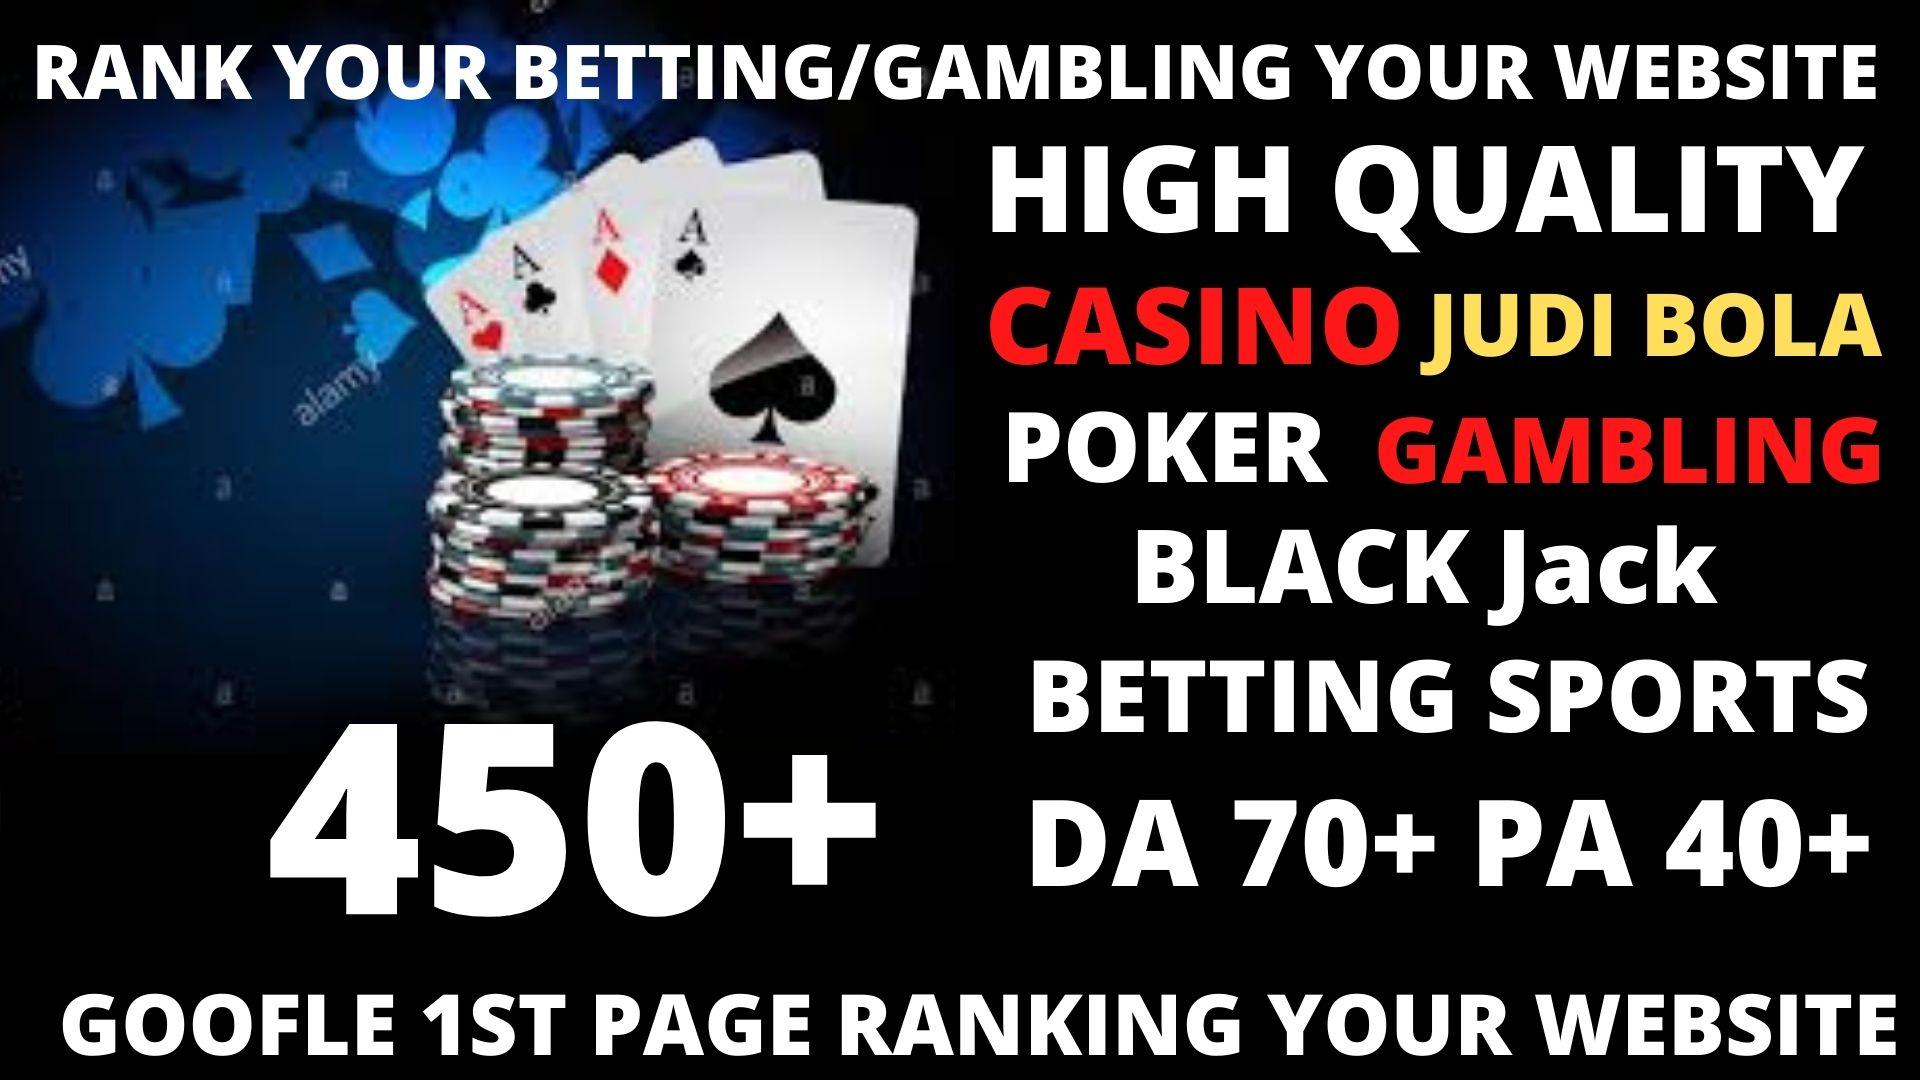 Permanent 450 powerful Casino,  Gambling,  Poker,  Sports High Quality Web2.0 Backlinks